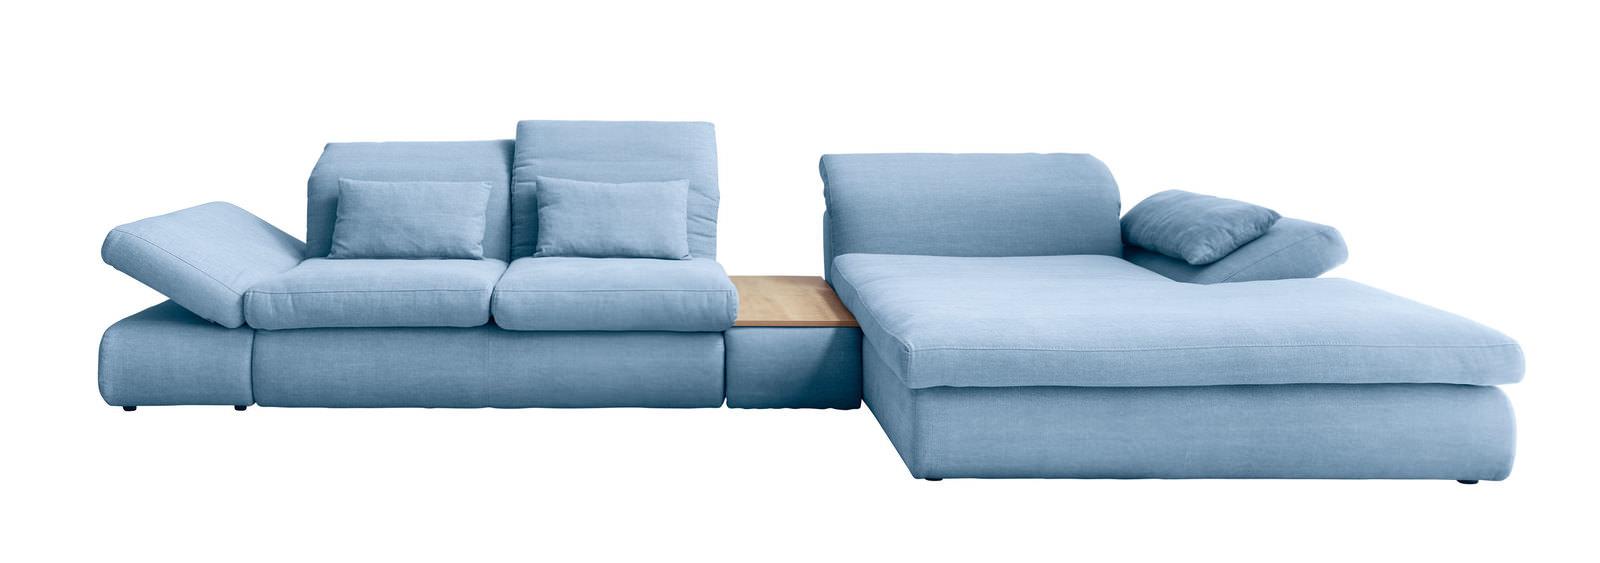 Mondo Longchairkombi Online Entdecken Knuffmann Ihr Möbelhaus